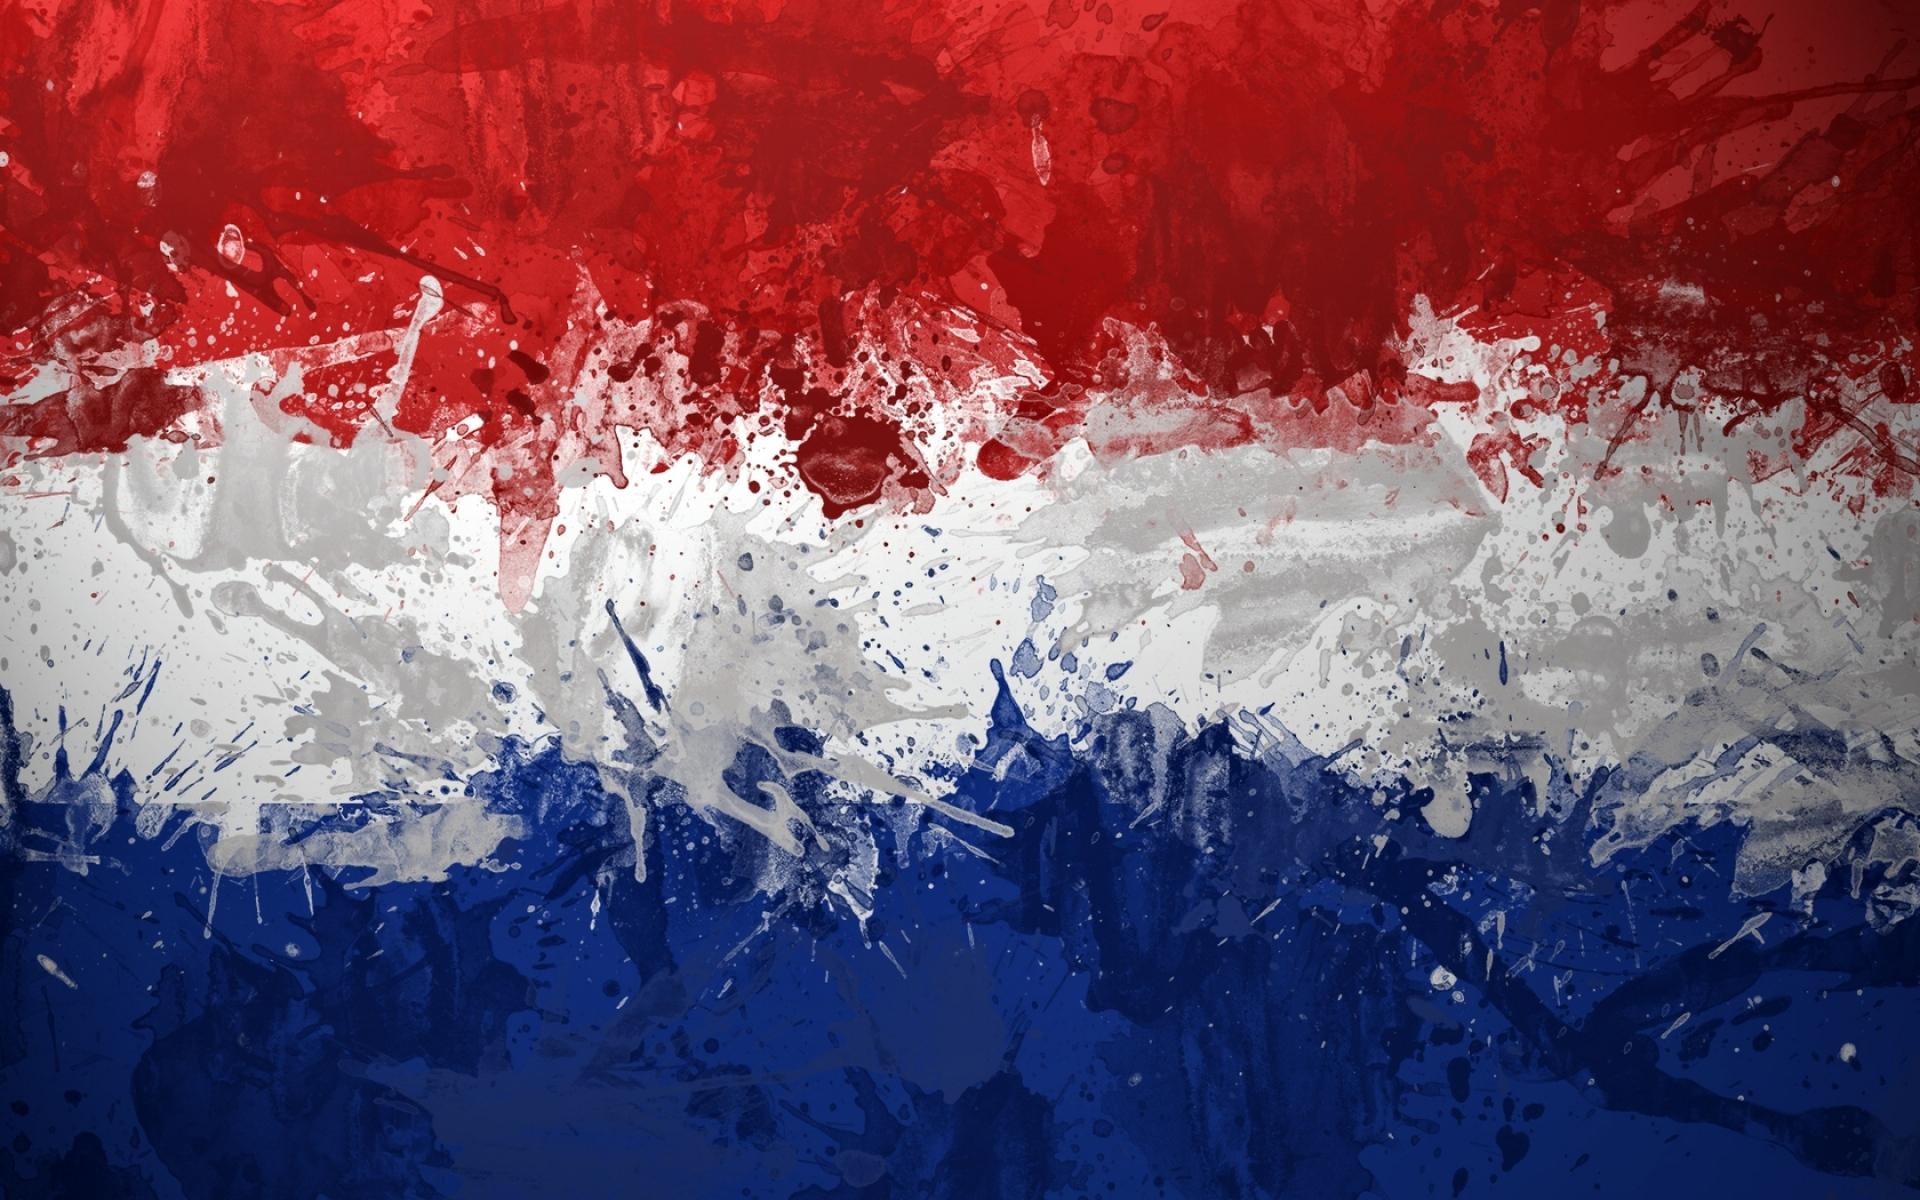 Картинки голландия, фон, нидерланды, царство, текстура, цвет фото и обои на рабочий стол